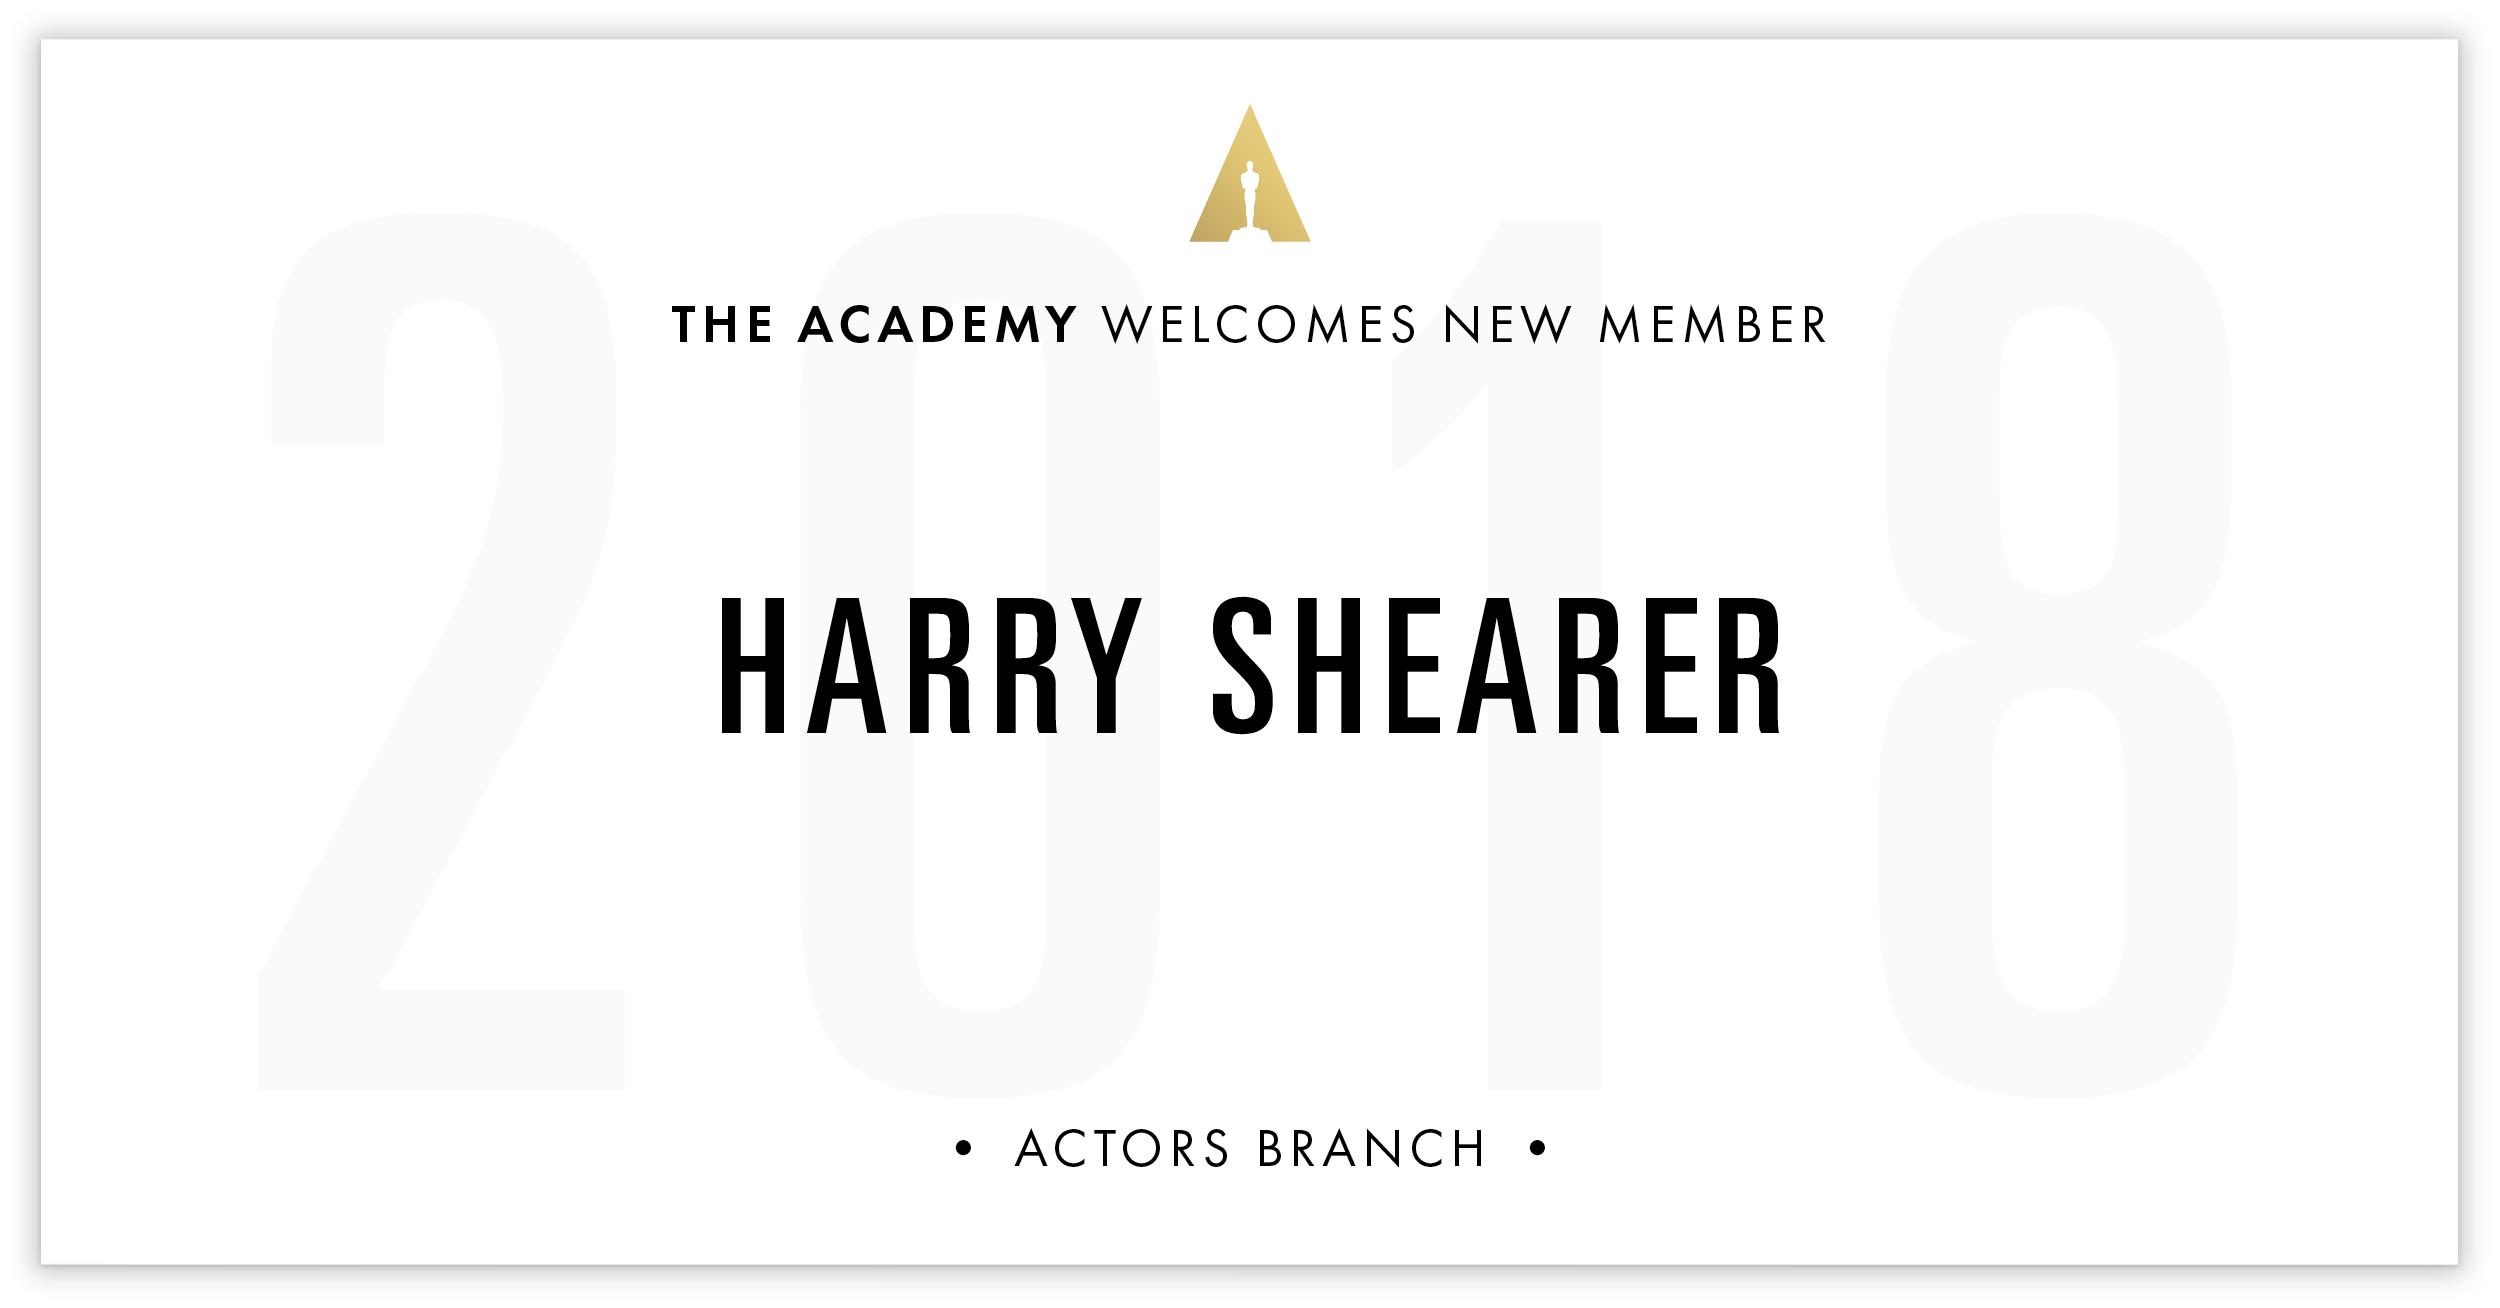 Harry Shearer is invited!